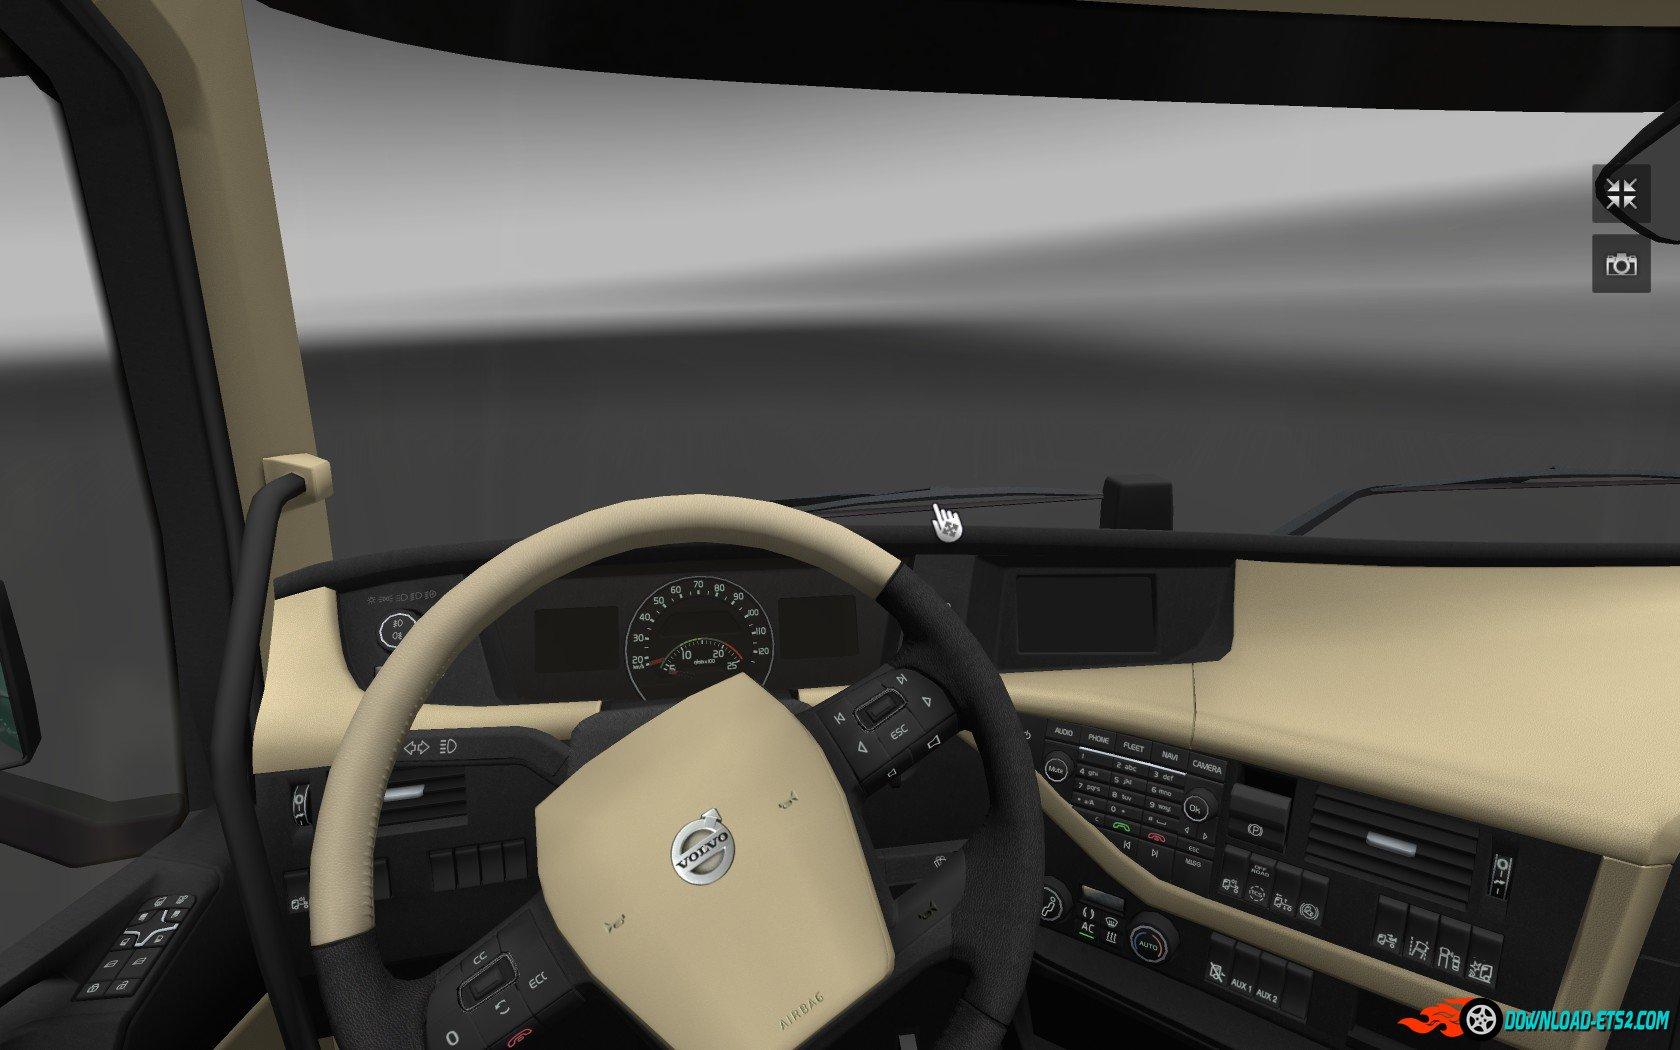 Volvo FH16 2012 - HD Interior v1.3 (by nIGhT-SoN)